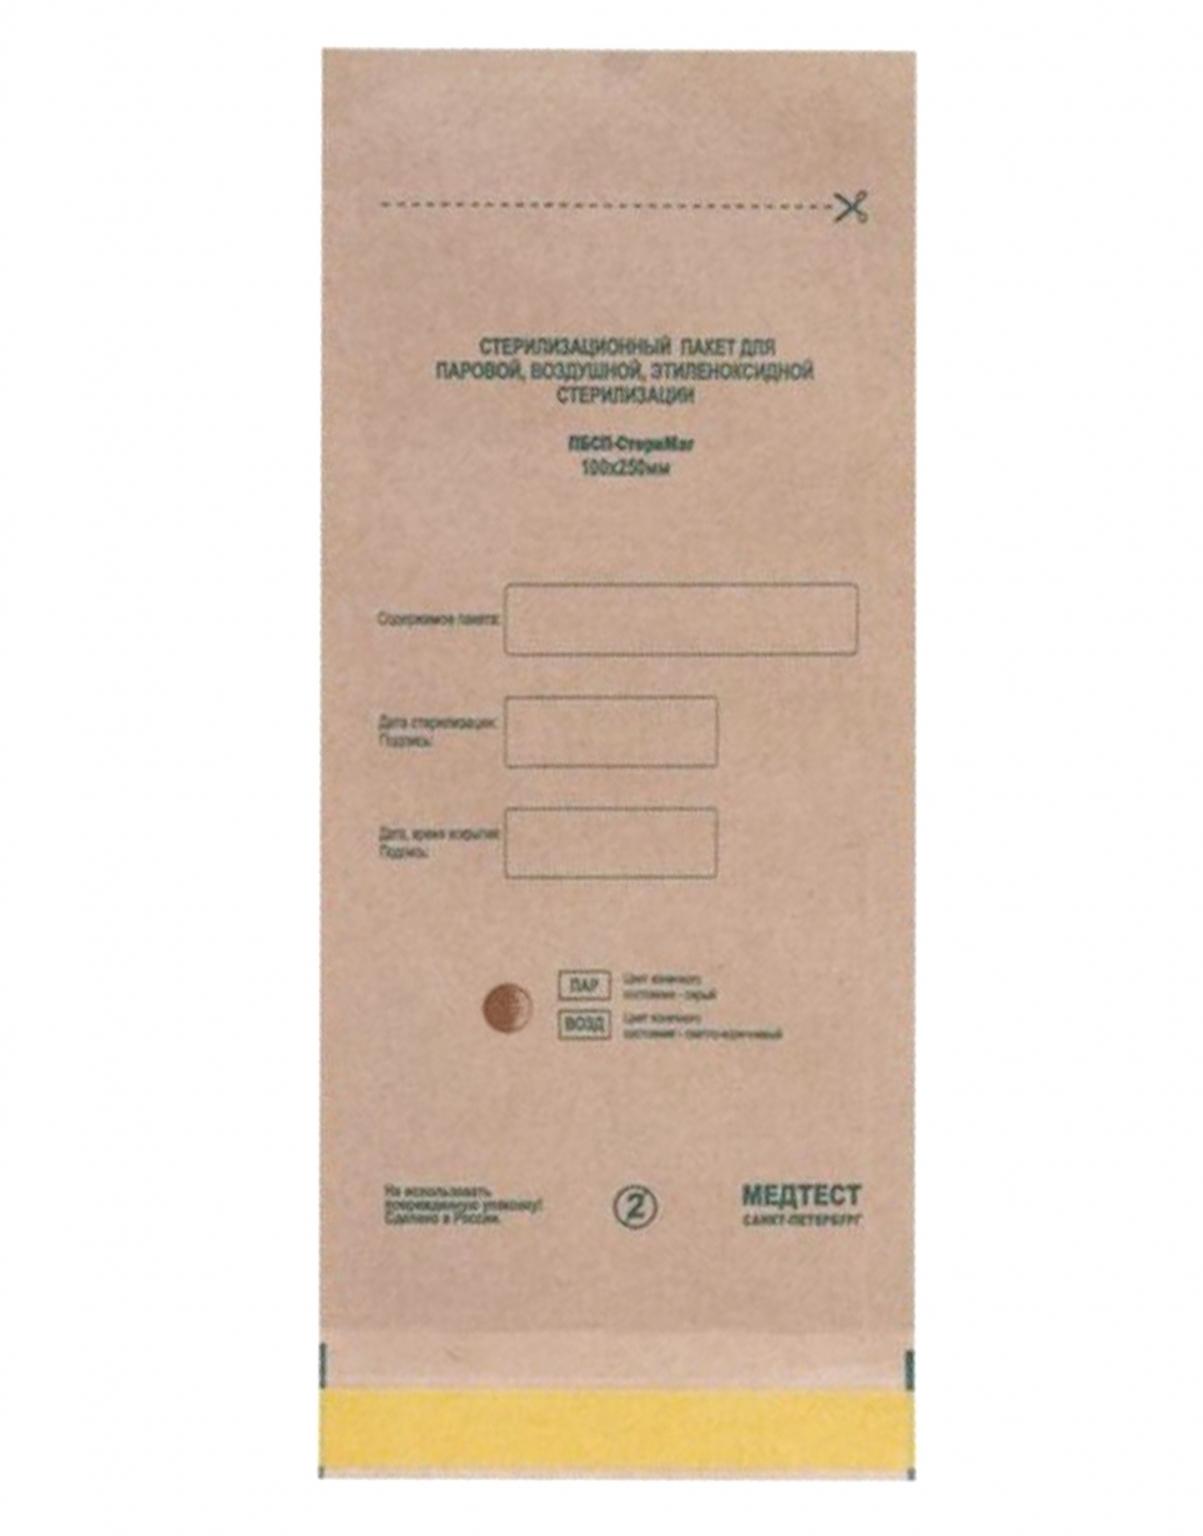 Крафт-пакеты для стерилизации 100*200мм (100 шт) №3861